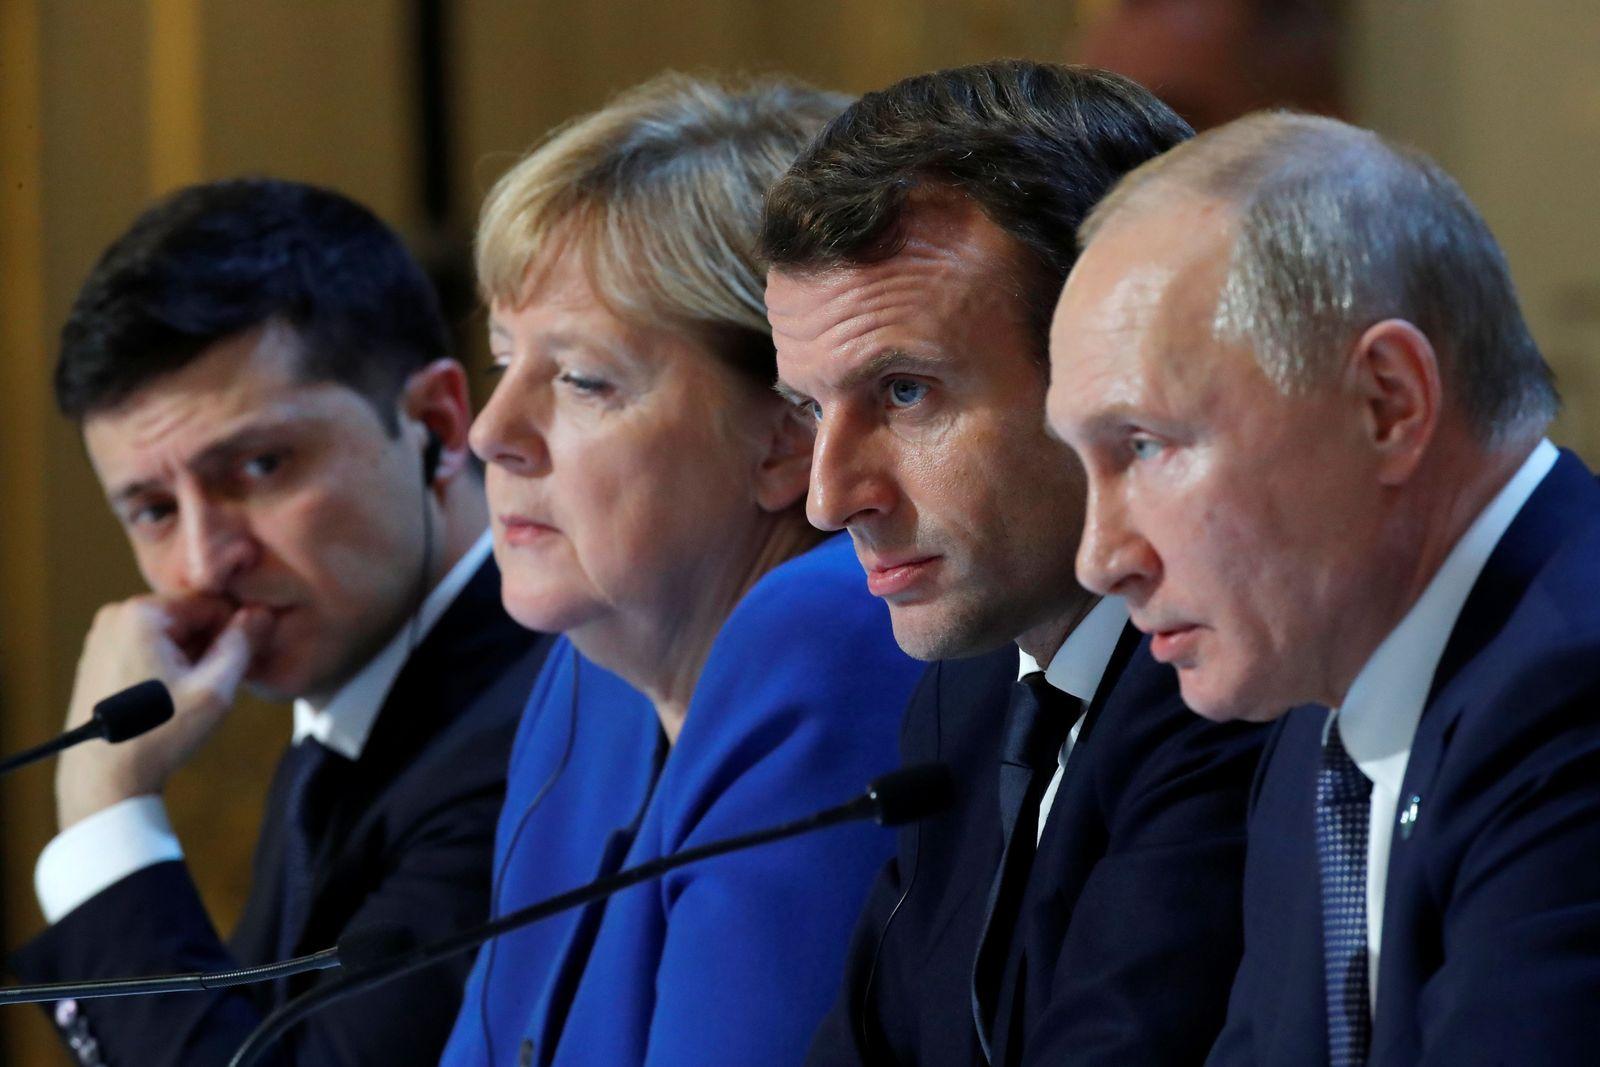 Ukraine-Gipfel / Selenskyj, Macron, Putin und Merkel